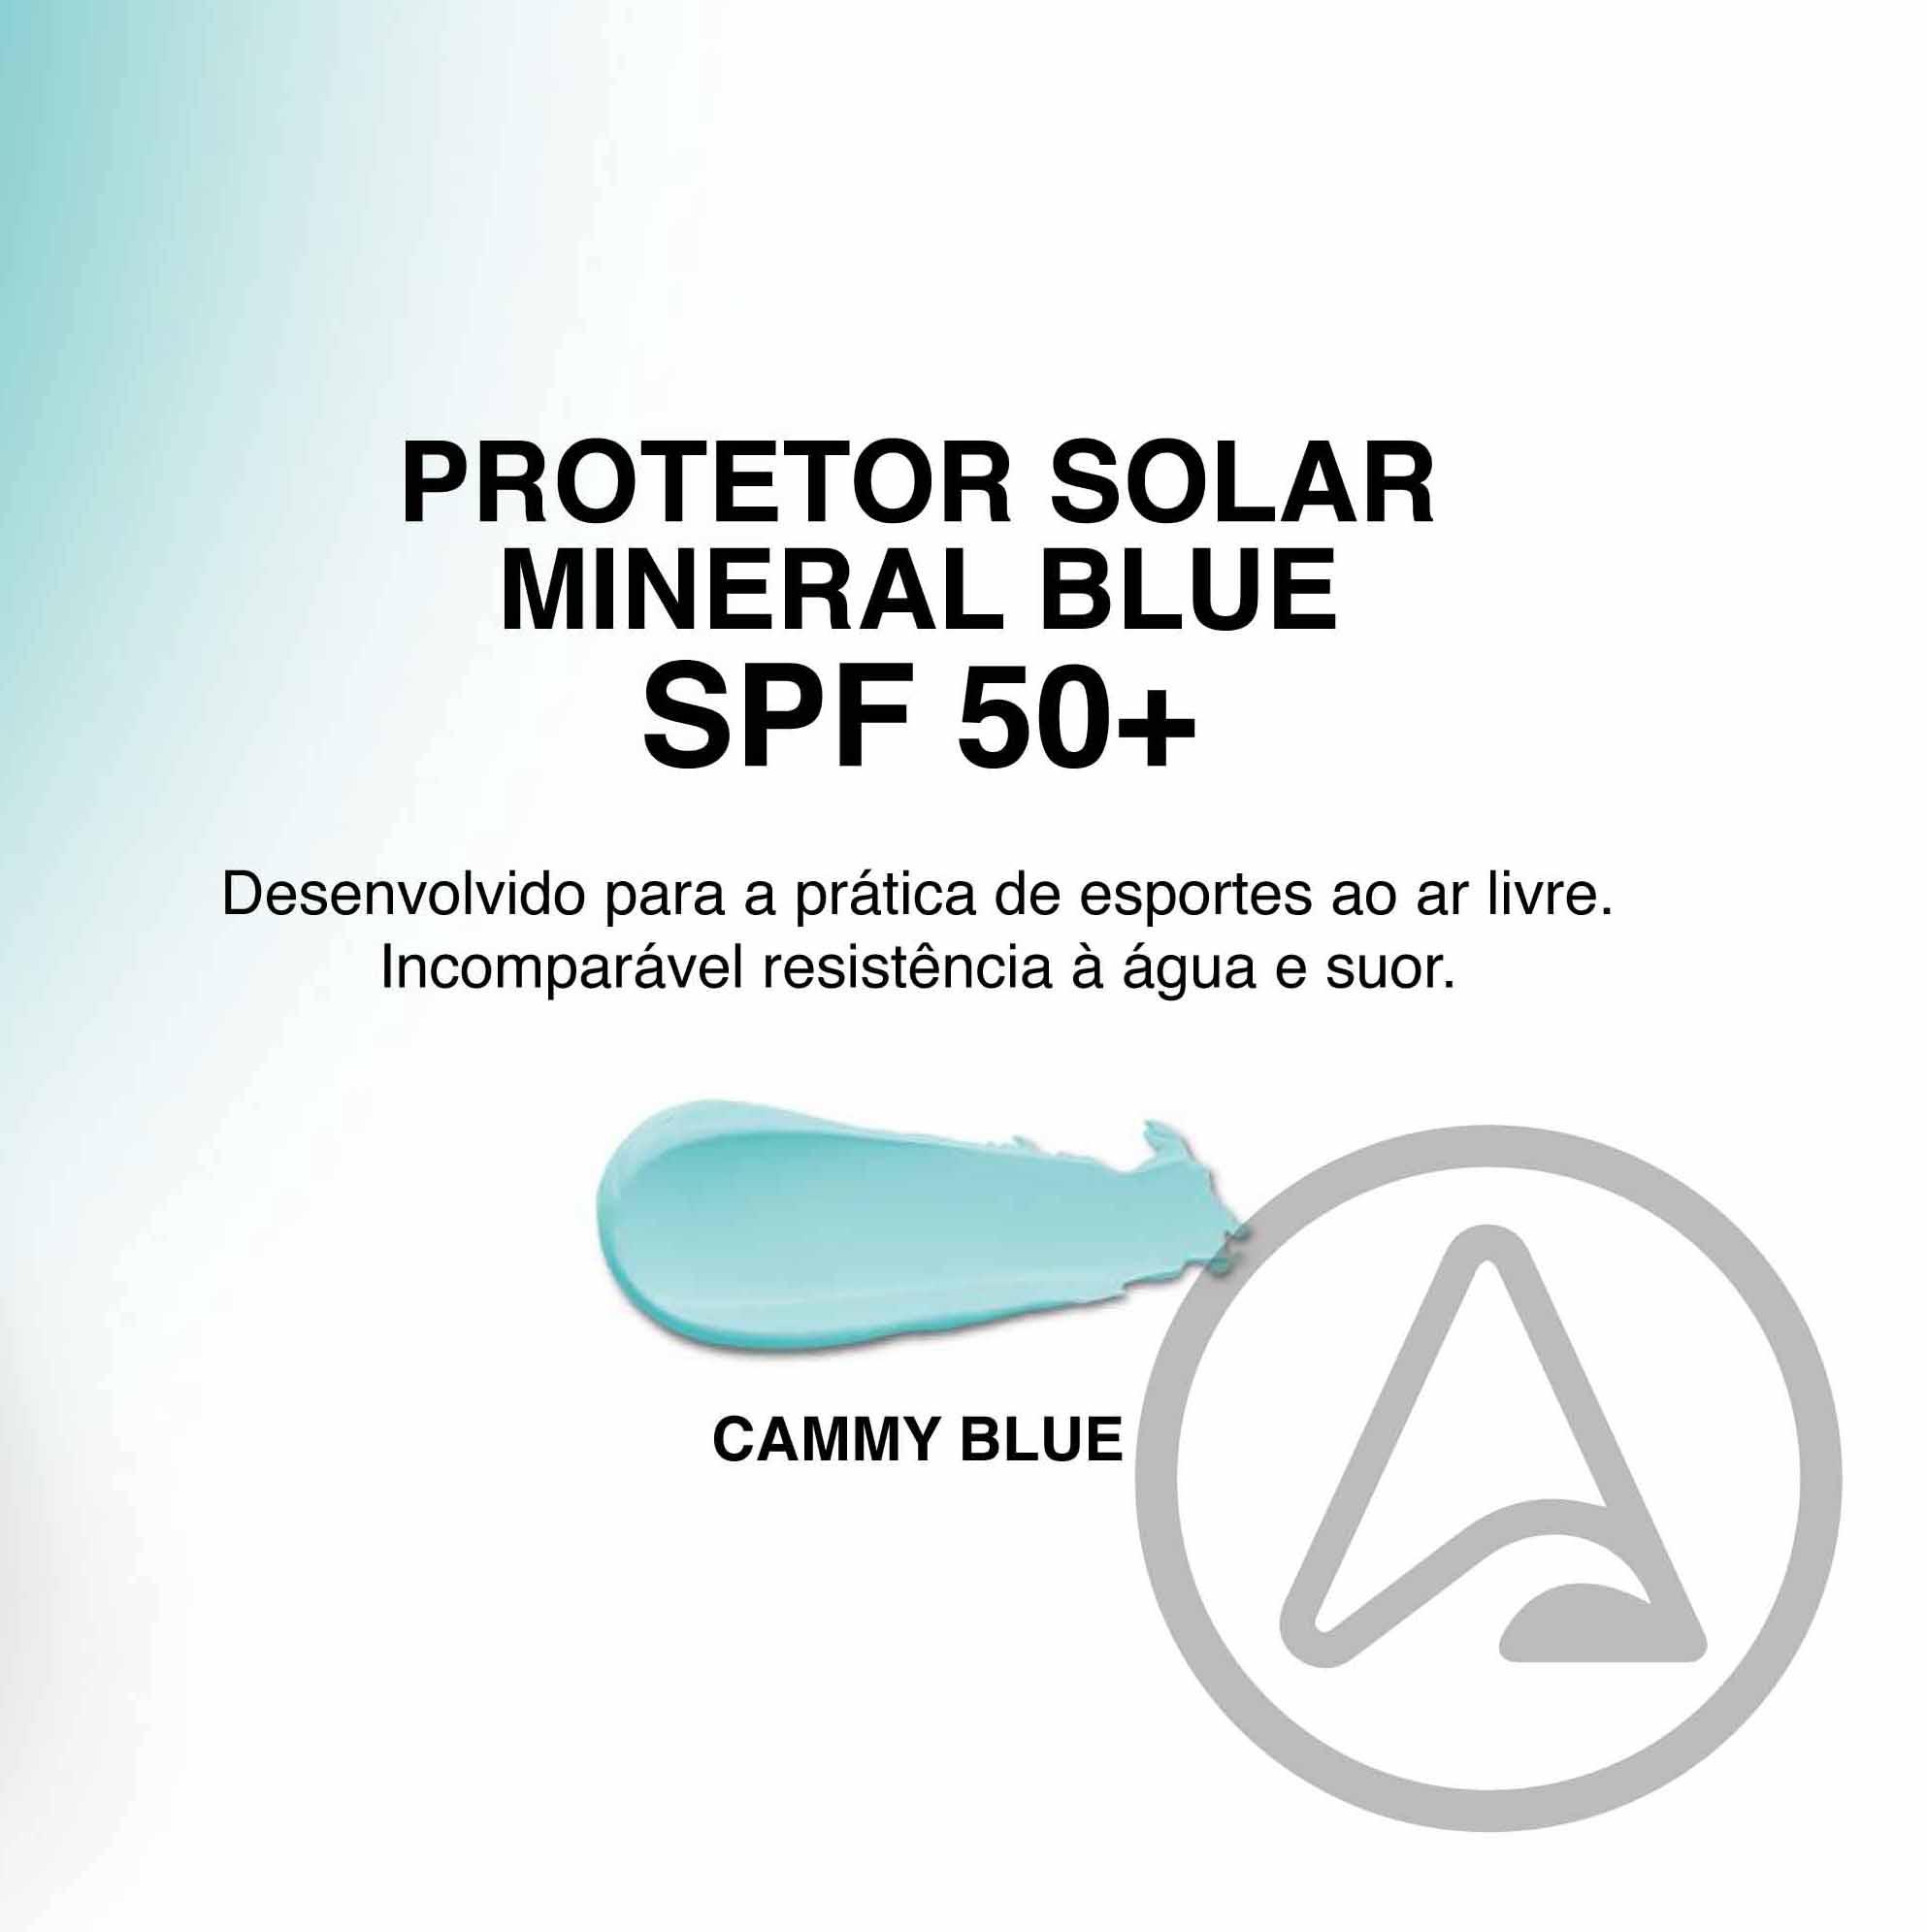 Protetor Solar Mineral - Chameleon Sun - BLUE - (Pote + Refil)